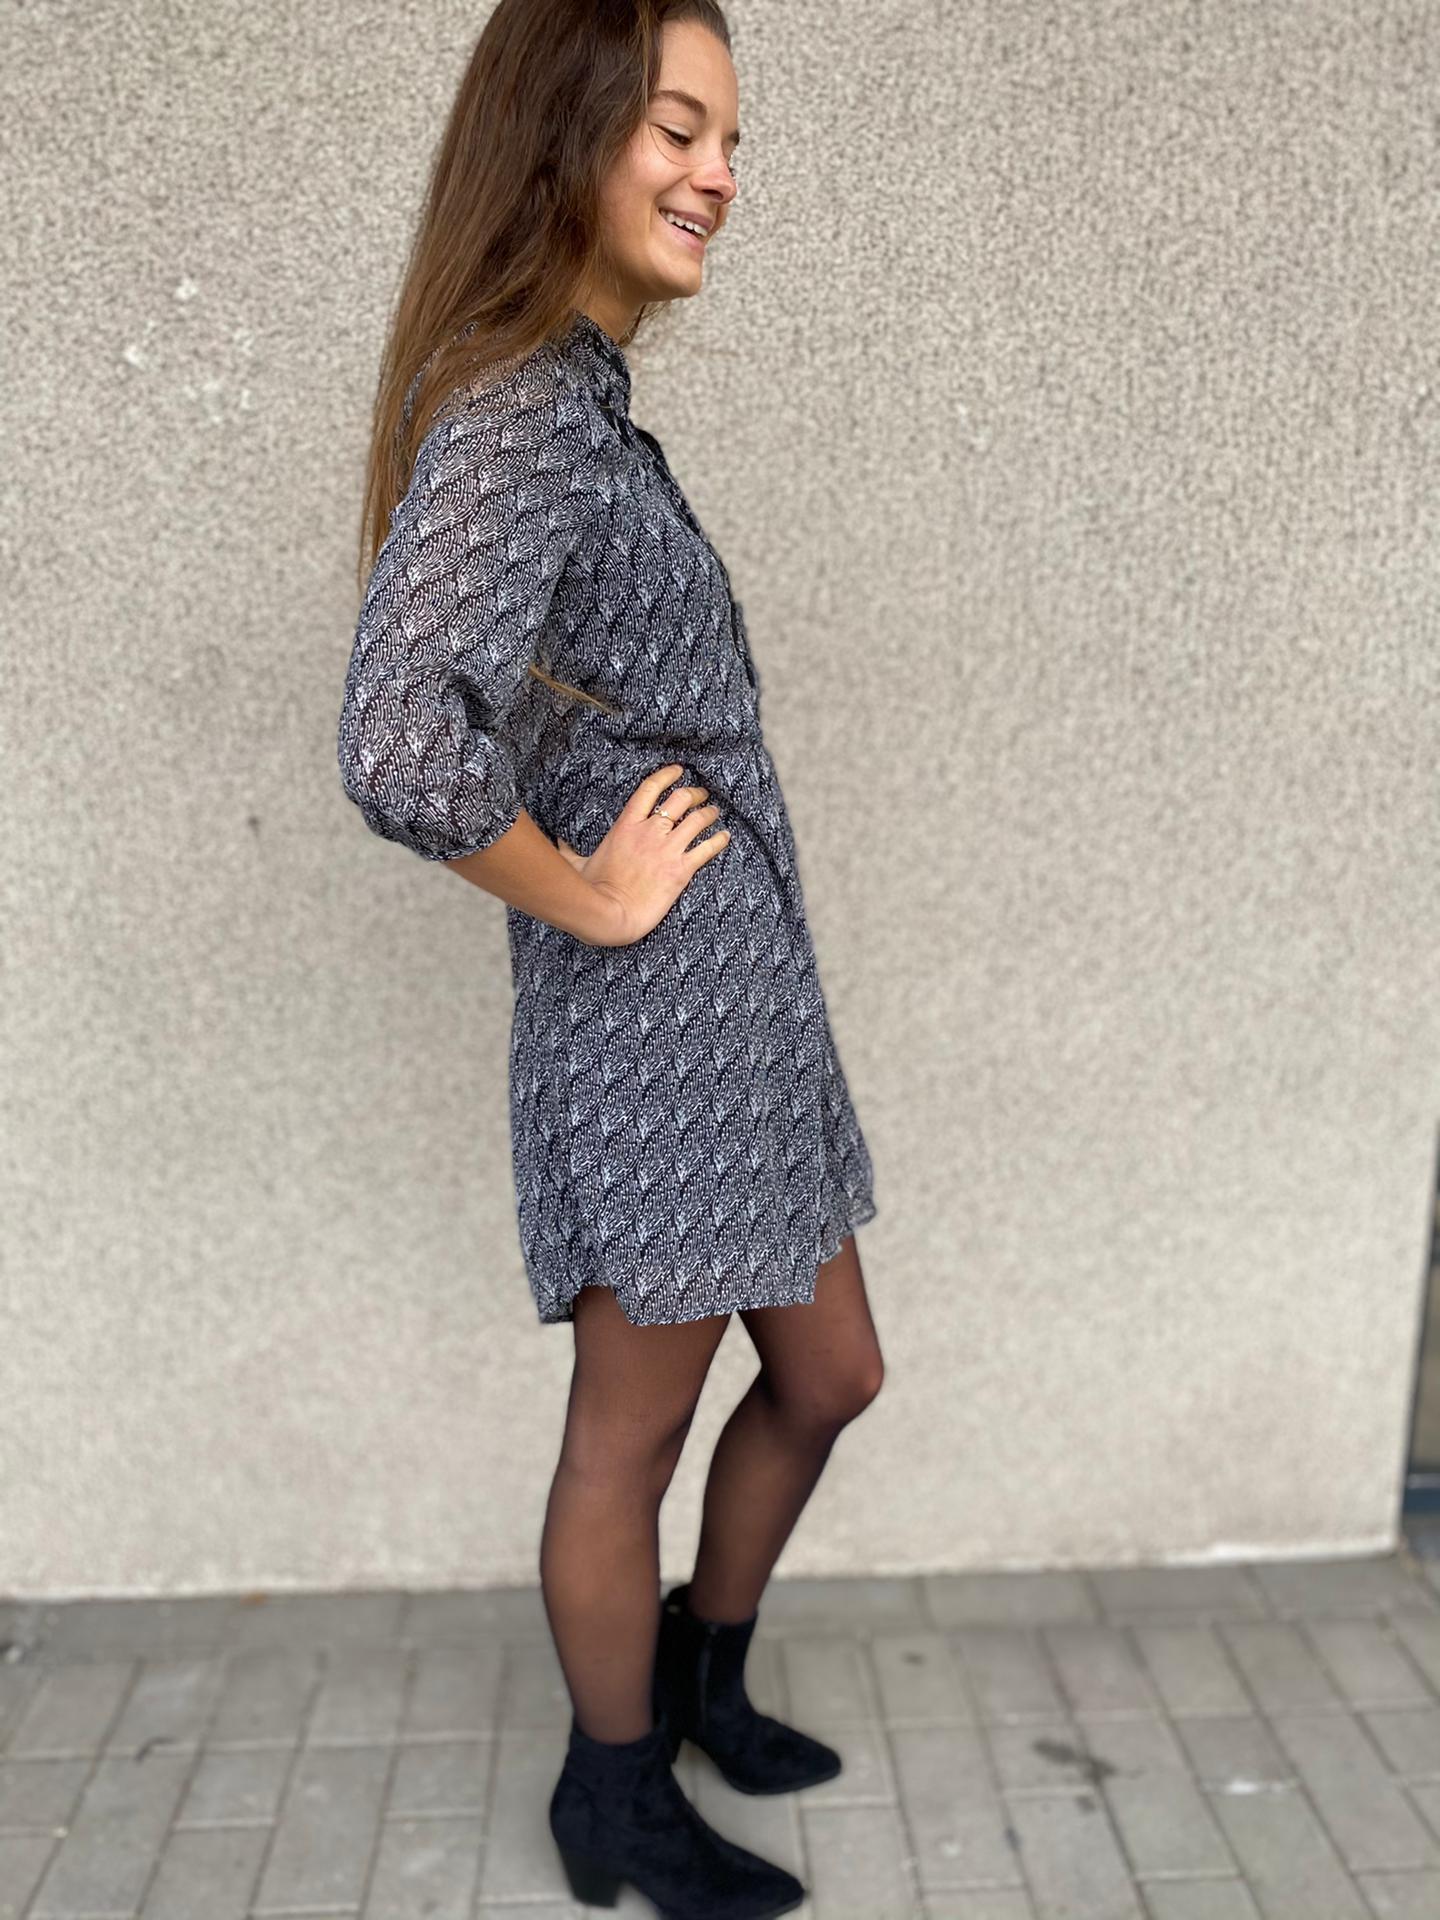 PEPITES robe cindy noir-3